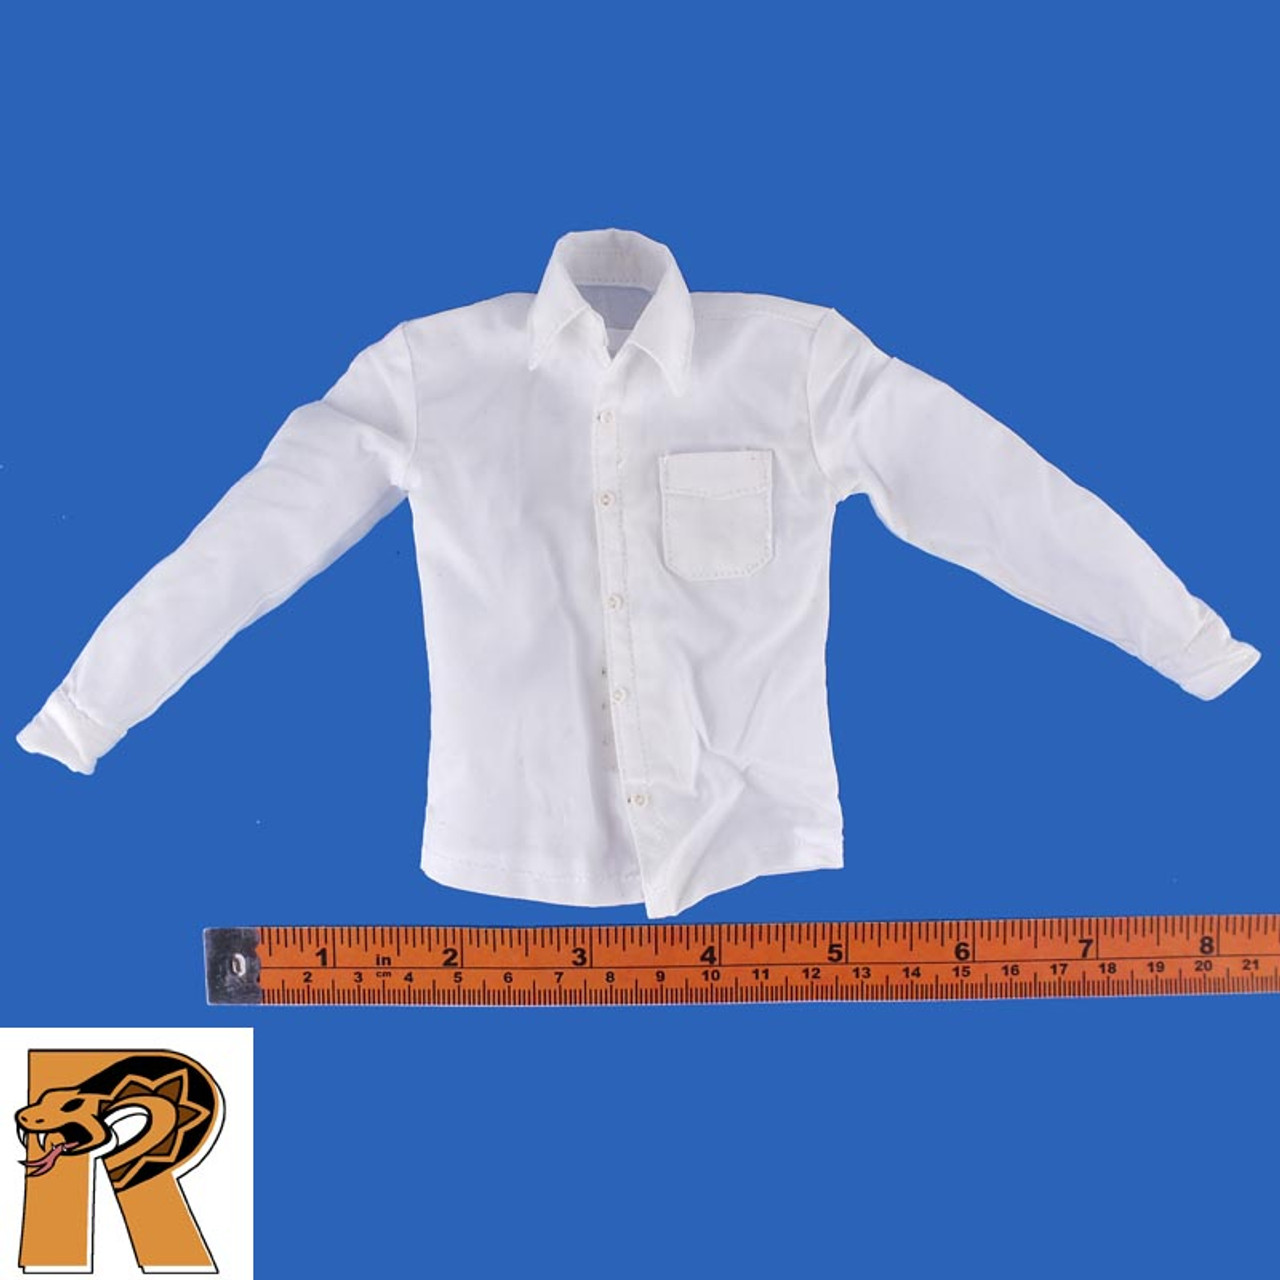 Spectre James Bond - White Dress Shirt - 1/6 Scale -